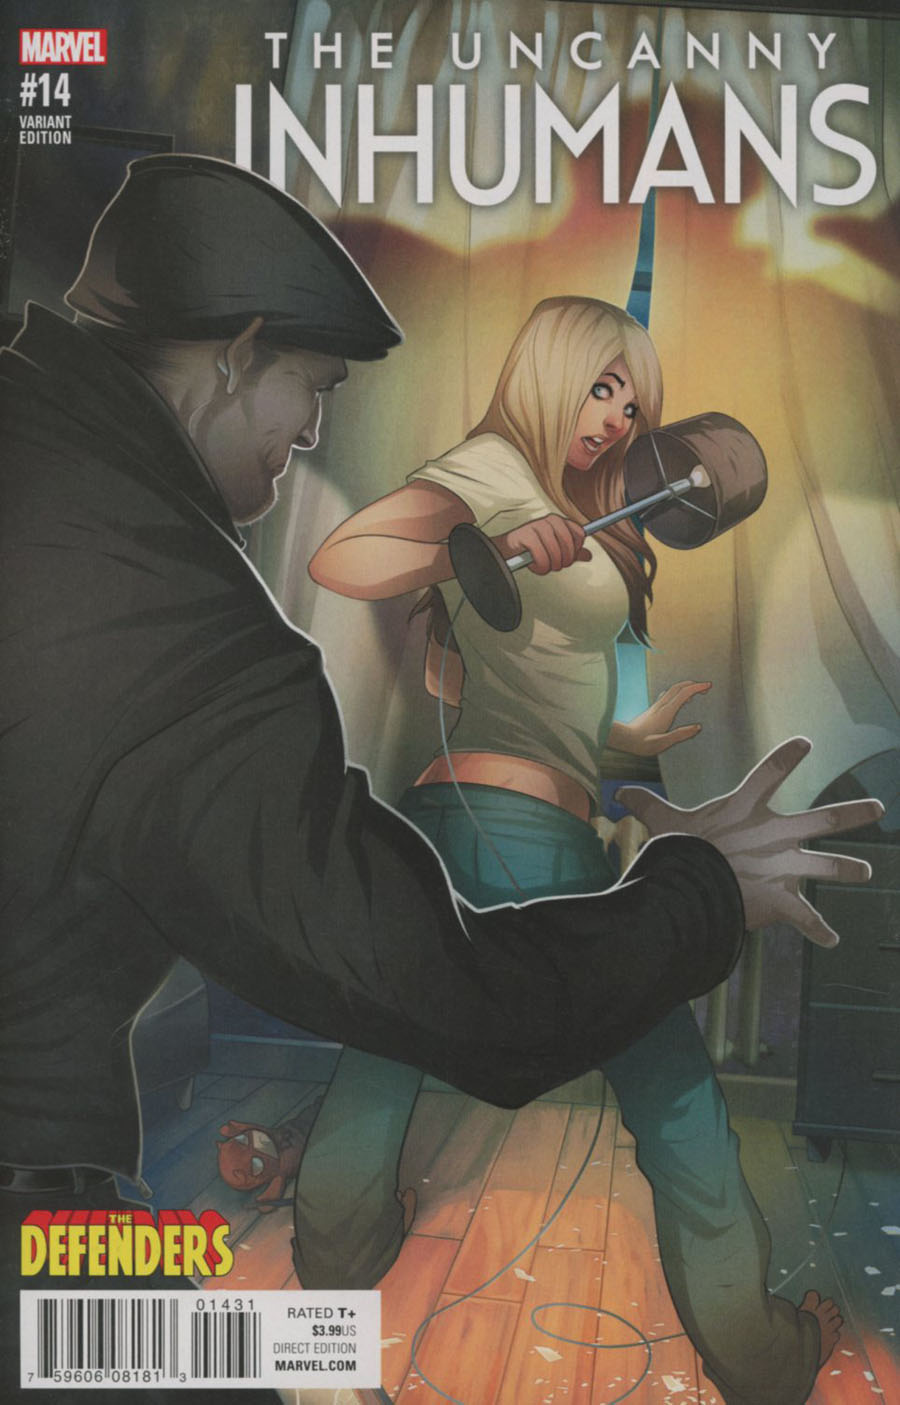 Uncanny Inhumans #14 Cover B Variant Elizabeth Torque Defenders Cover (Civil War II Tie-In)